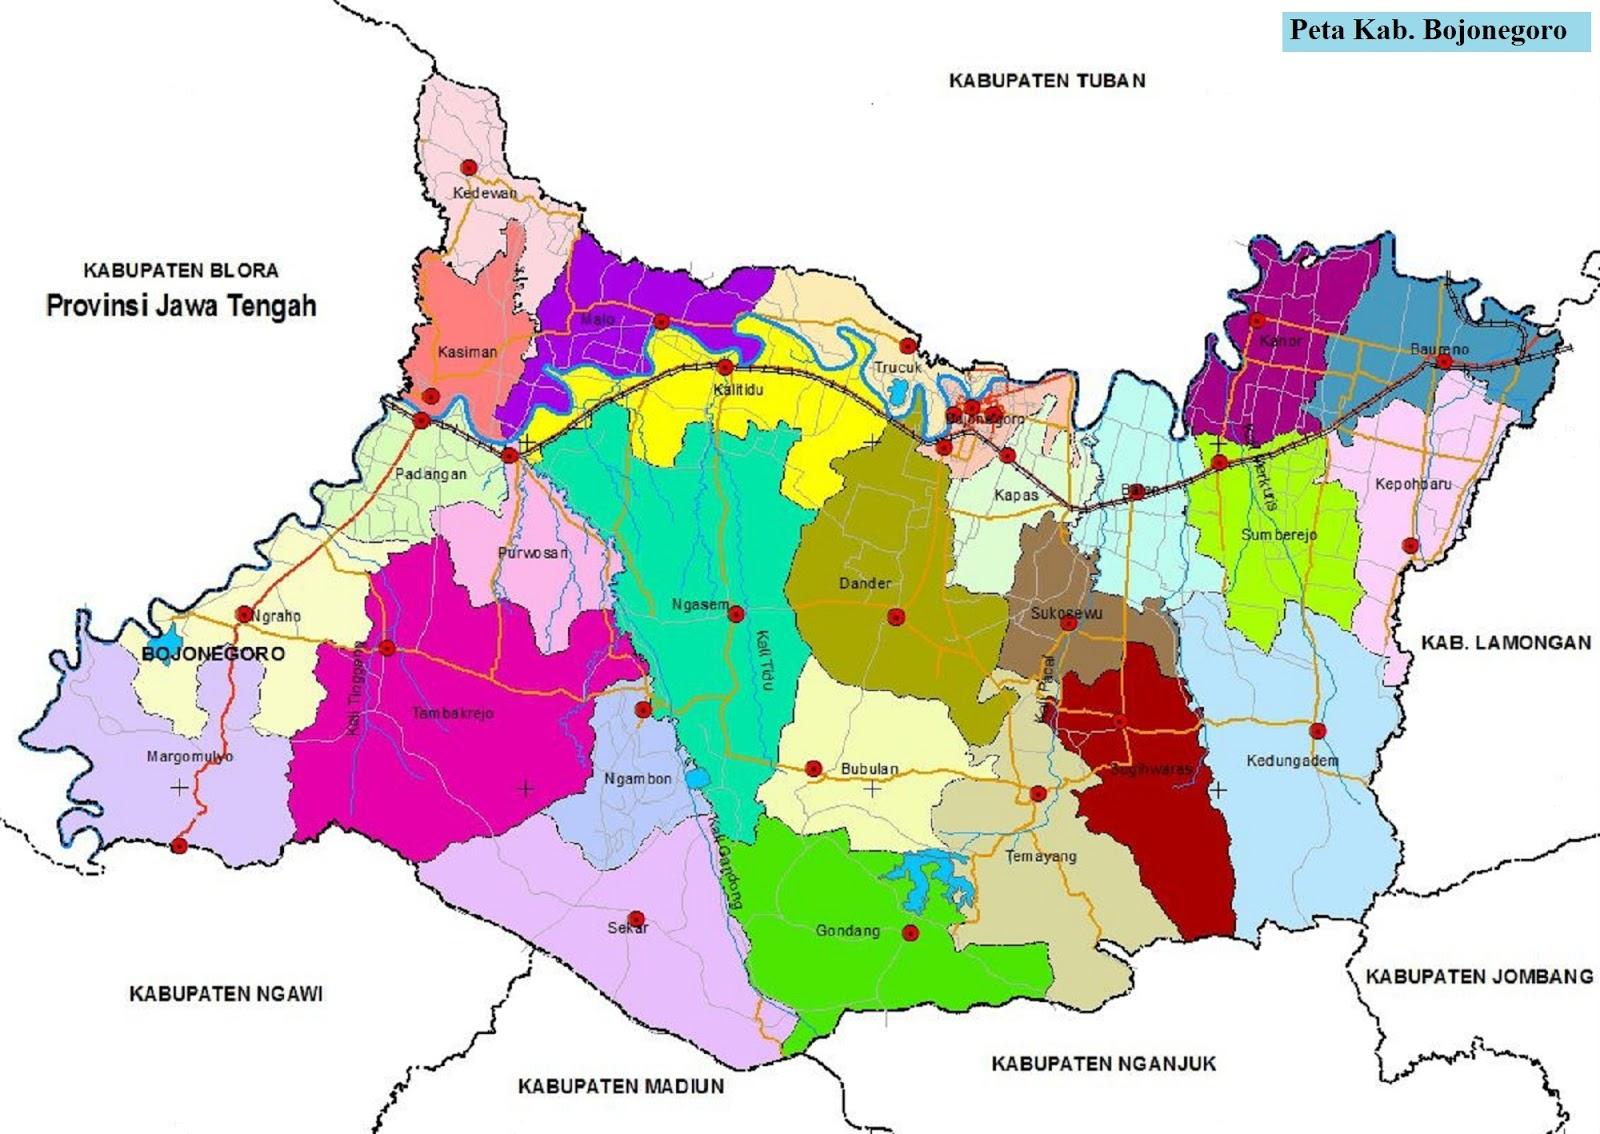 Peta Kabupaten Bojonegoro